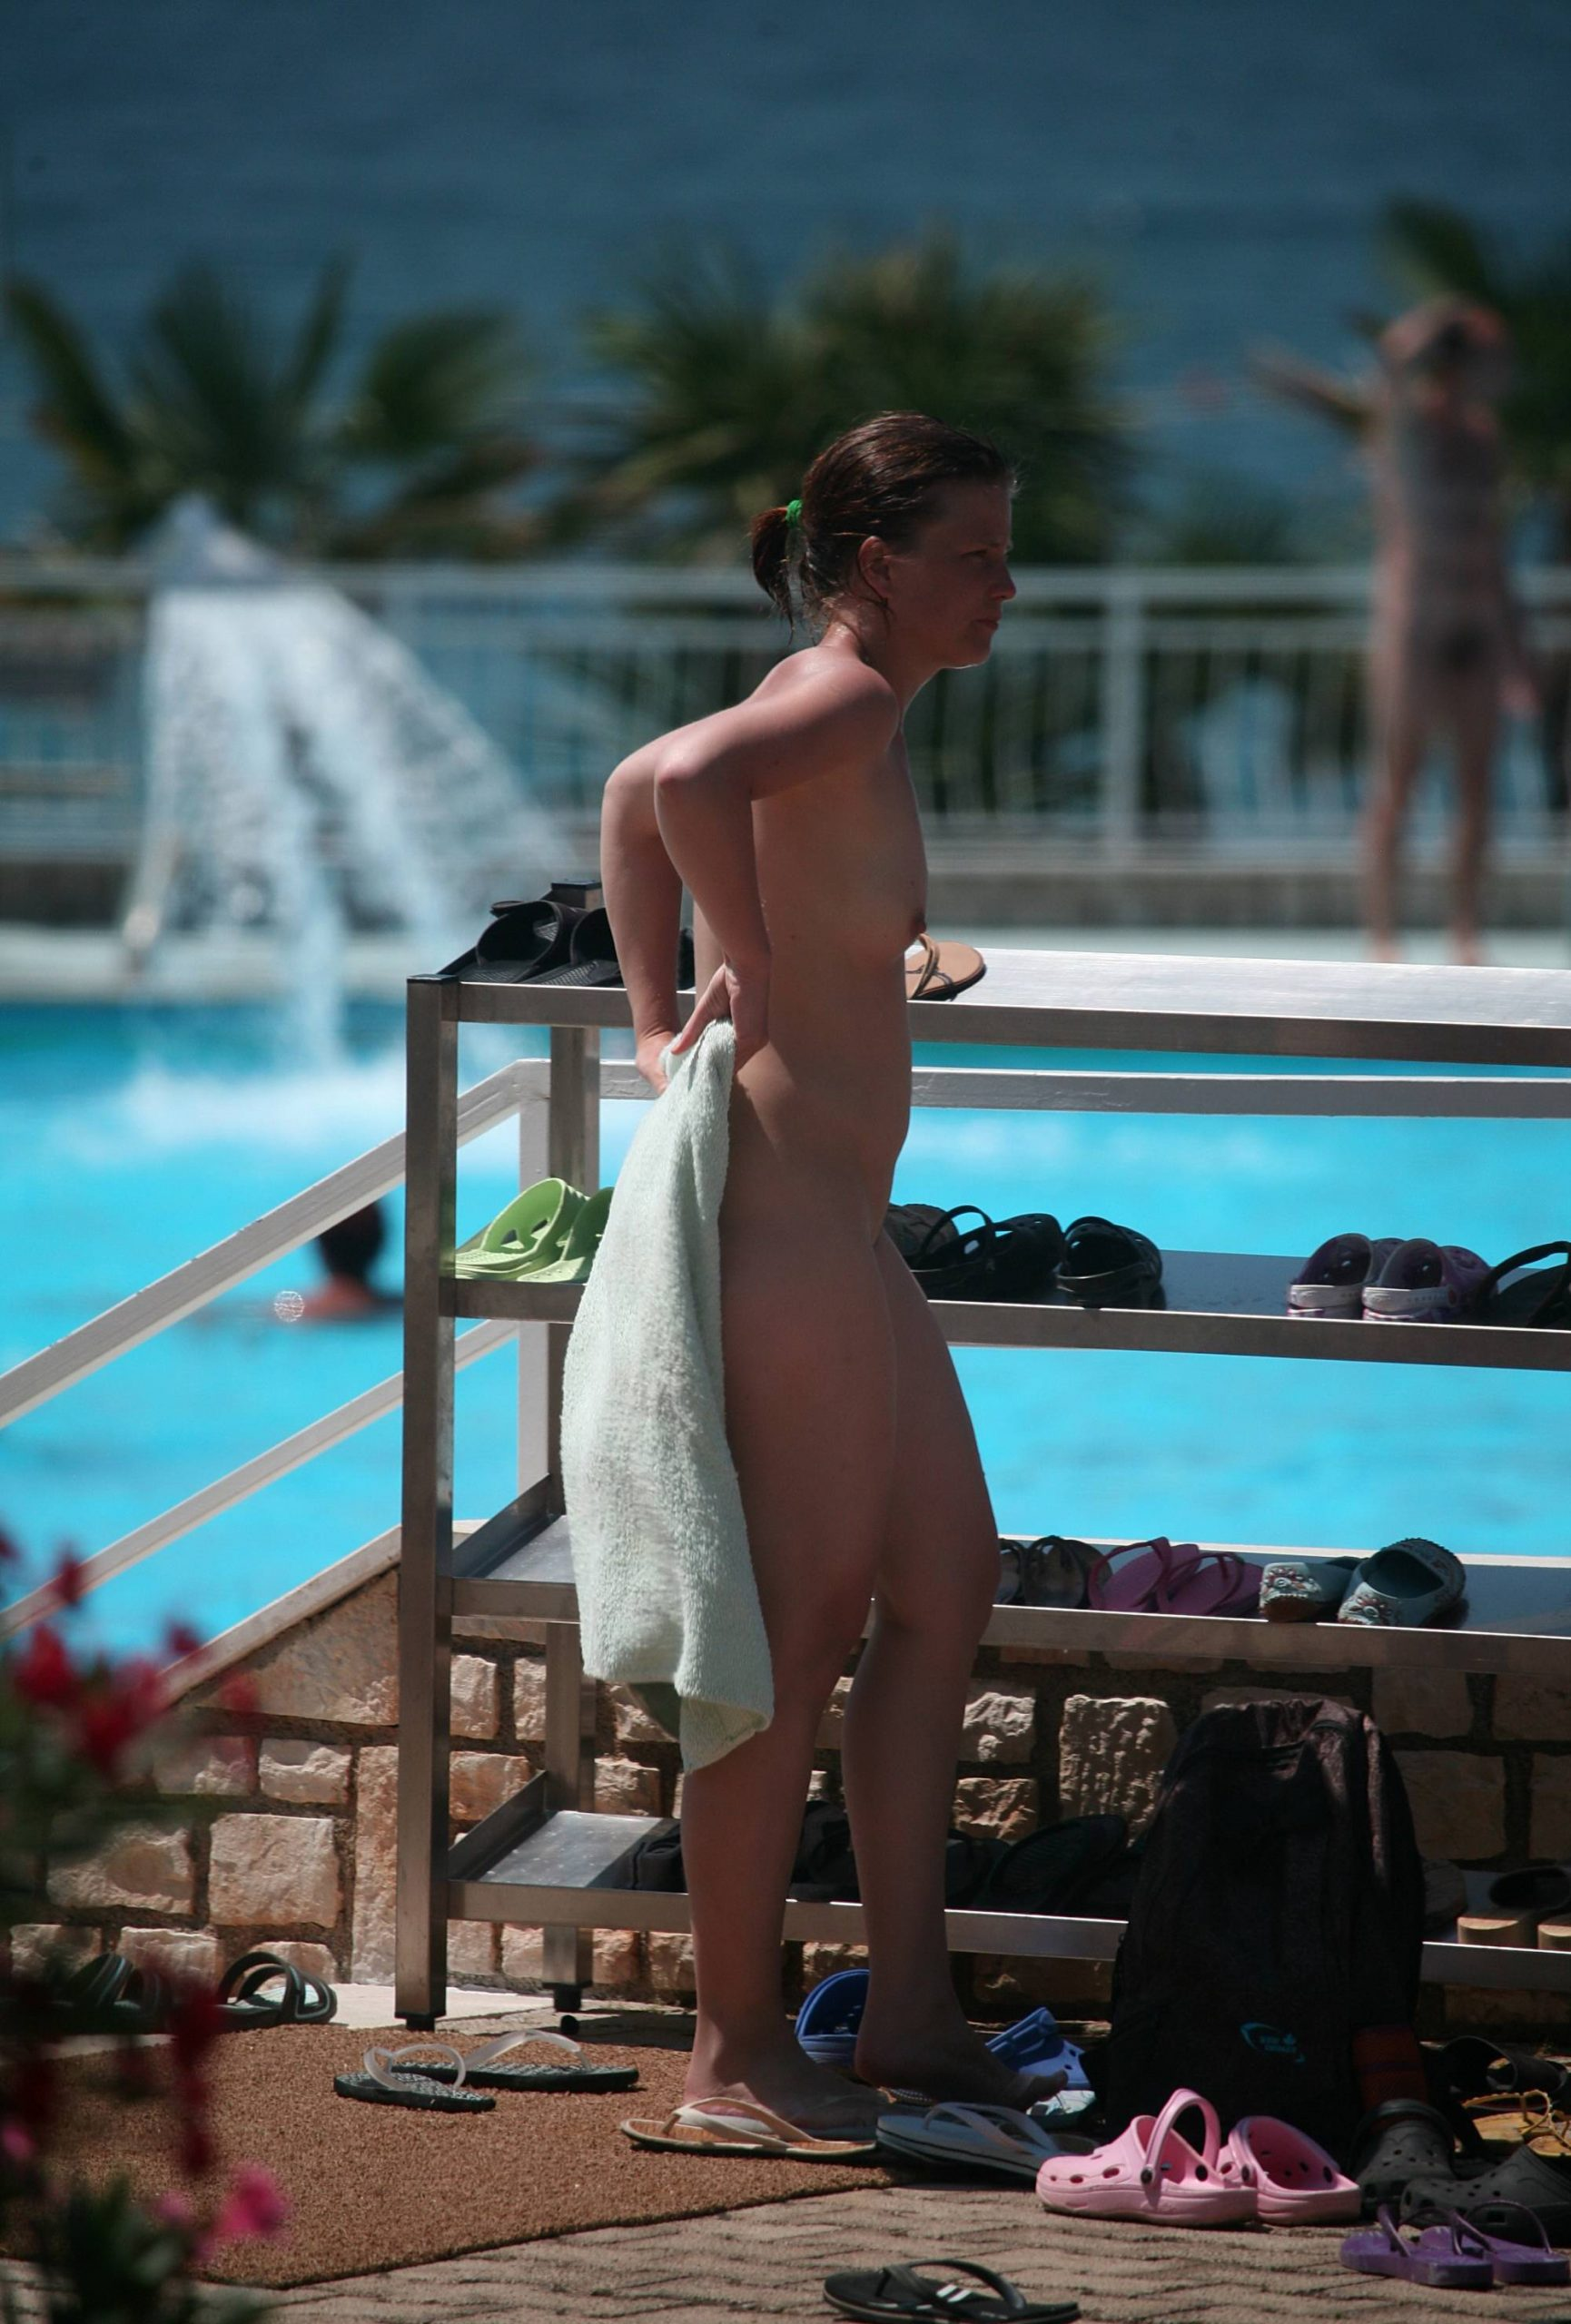 Pure Nudism Pics-Mom And Daughter Swim - 1